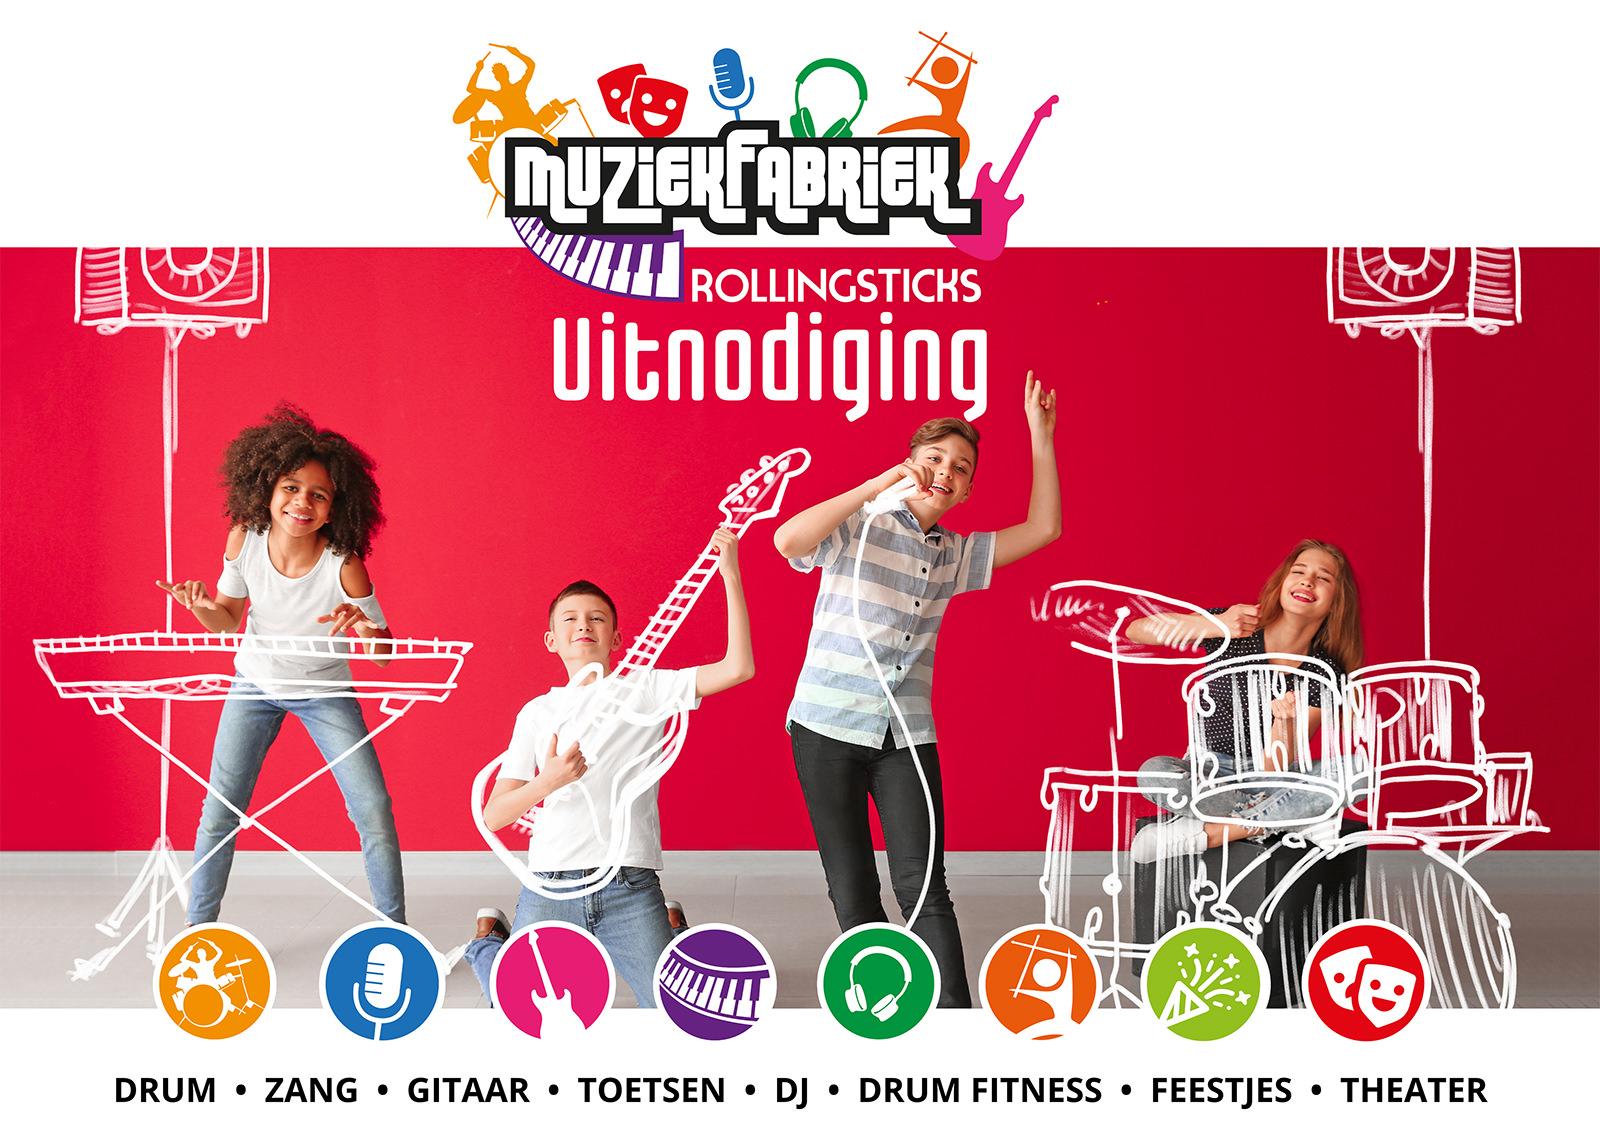 Zangles Gouda, Gitaarles Gouda, Drumles Gouda, Pianoles Gouda, drumfitness, theater, kinderfeestjes, DJ les